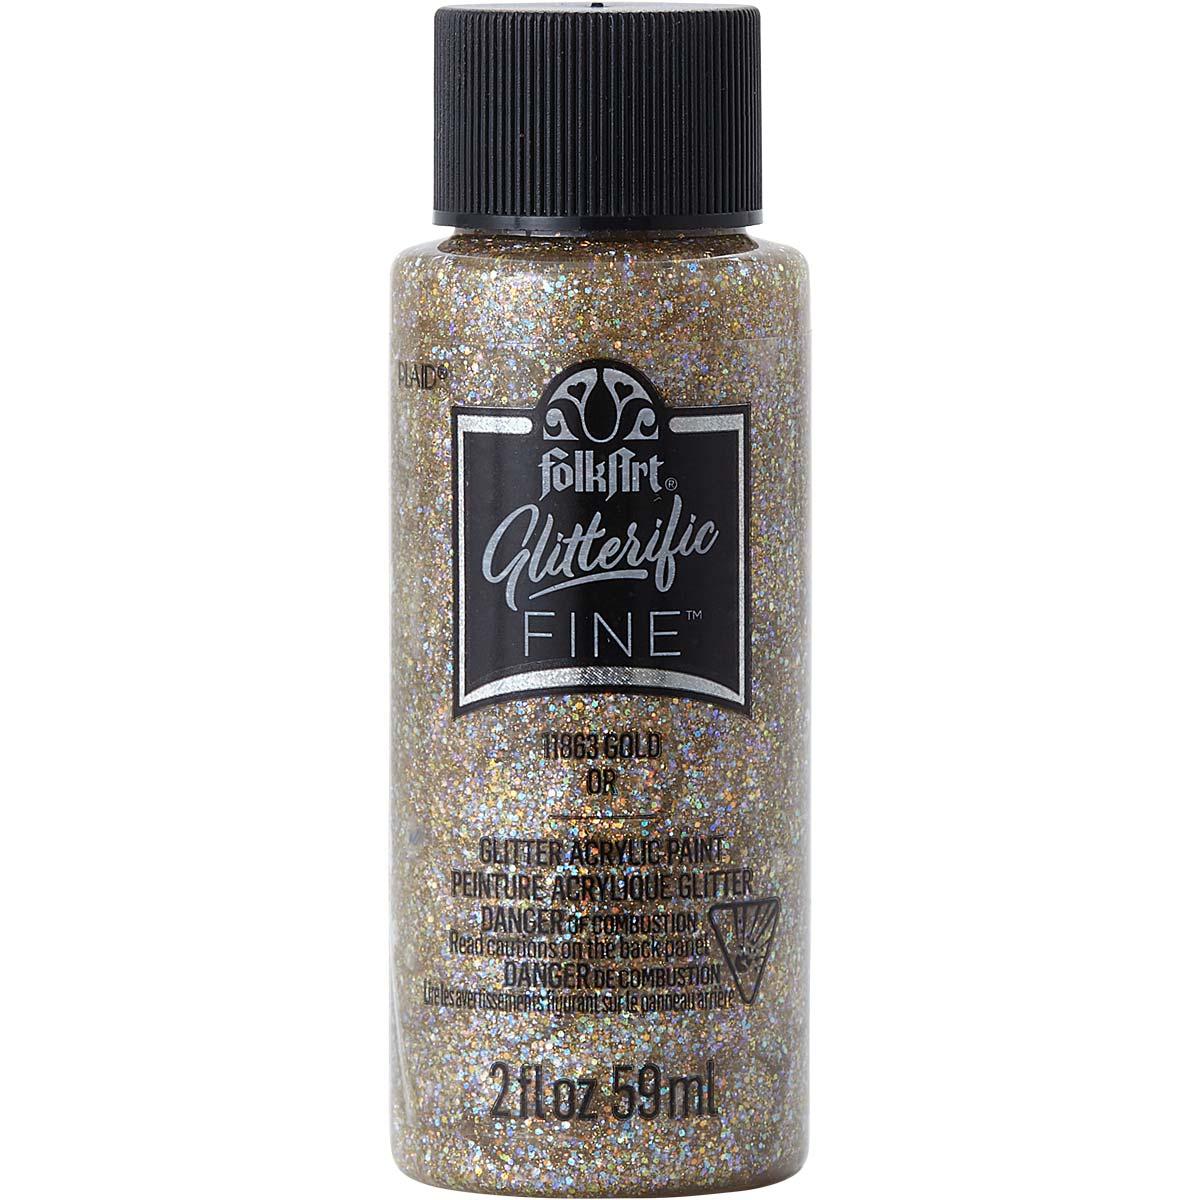 FolkArt ® Glitterific Fine™ Acrylic Paint - Gold, 2 oz. - 11863